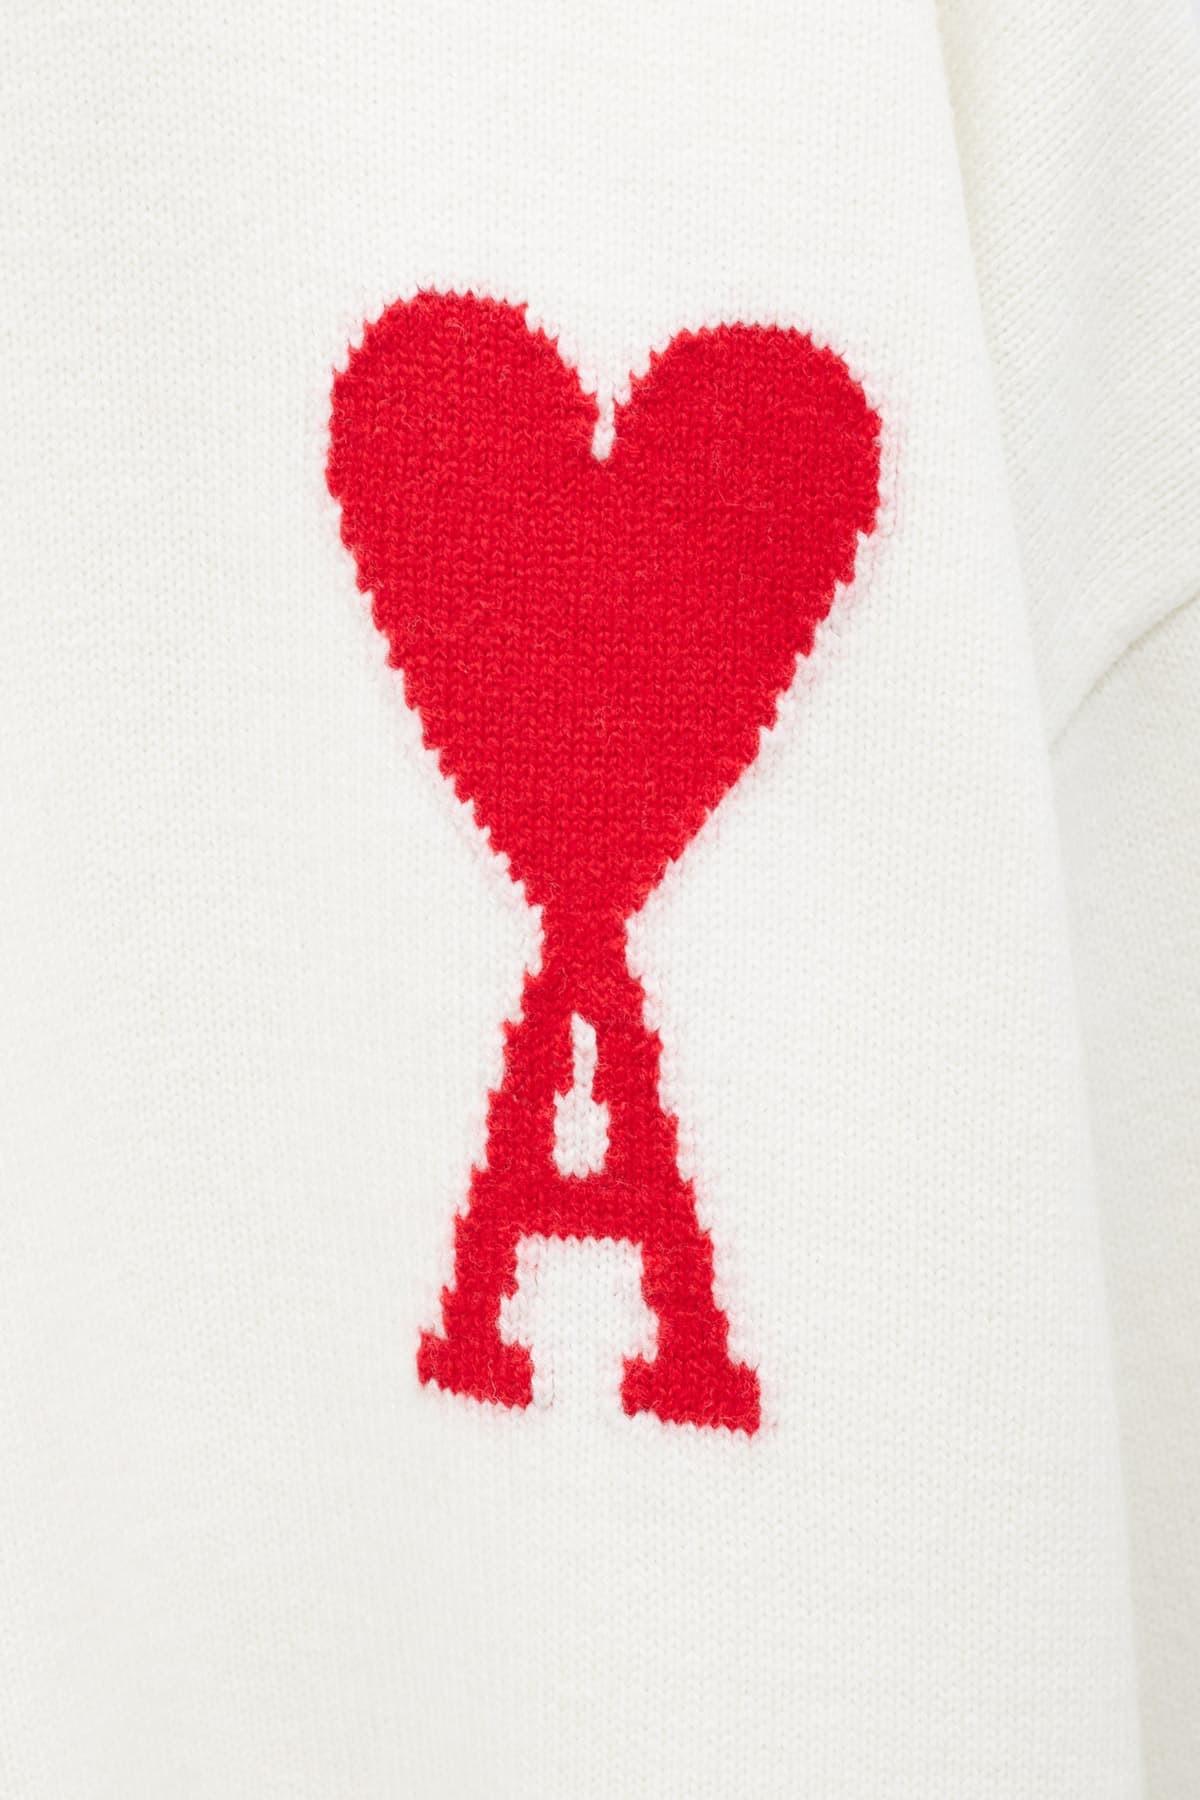 Comprar Comme Des Garcons x Futura Black W28611 Tote Bag